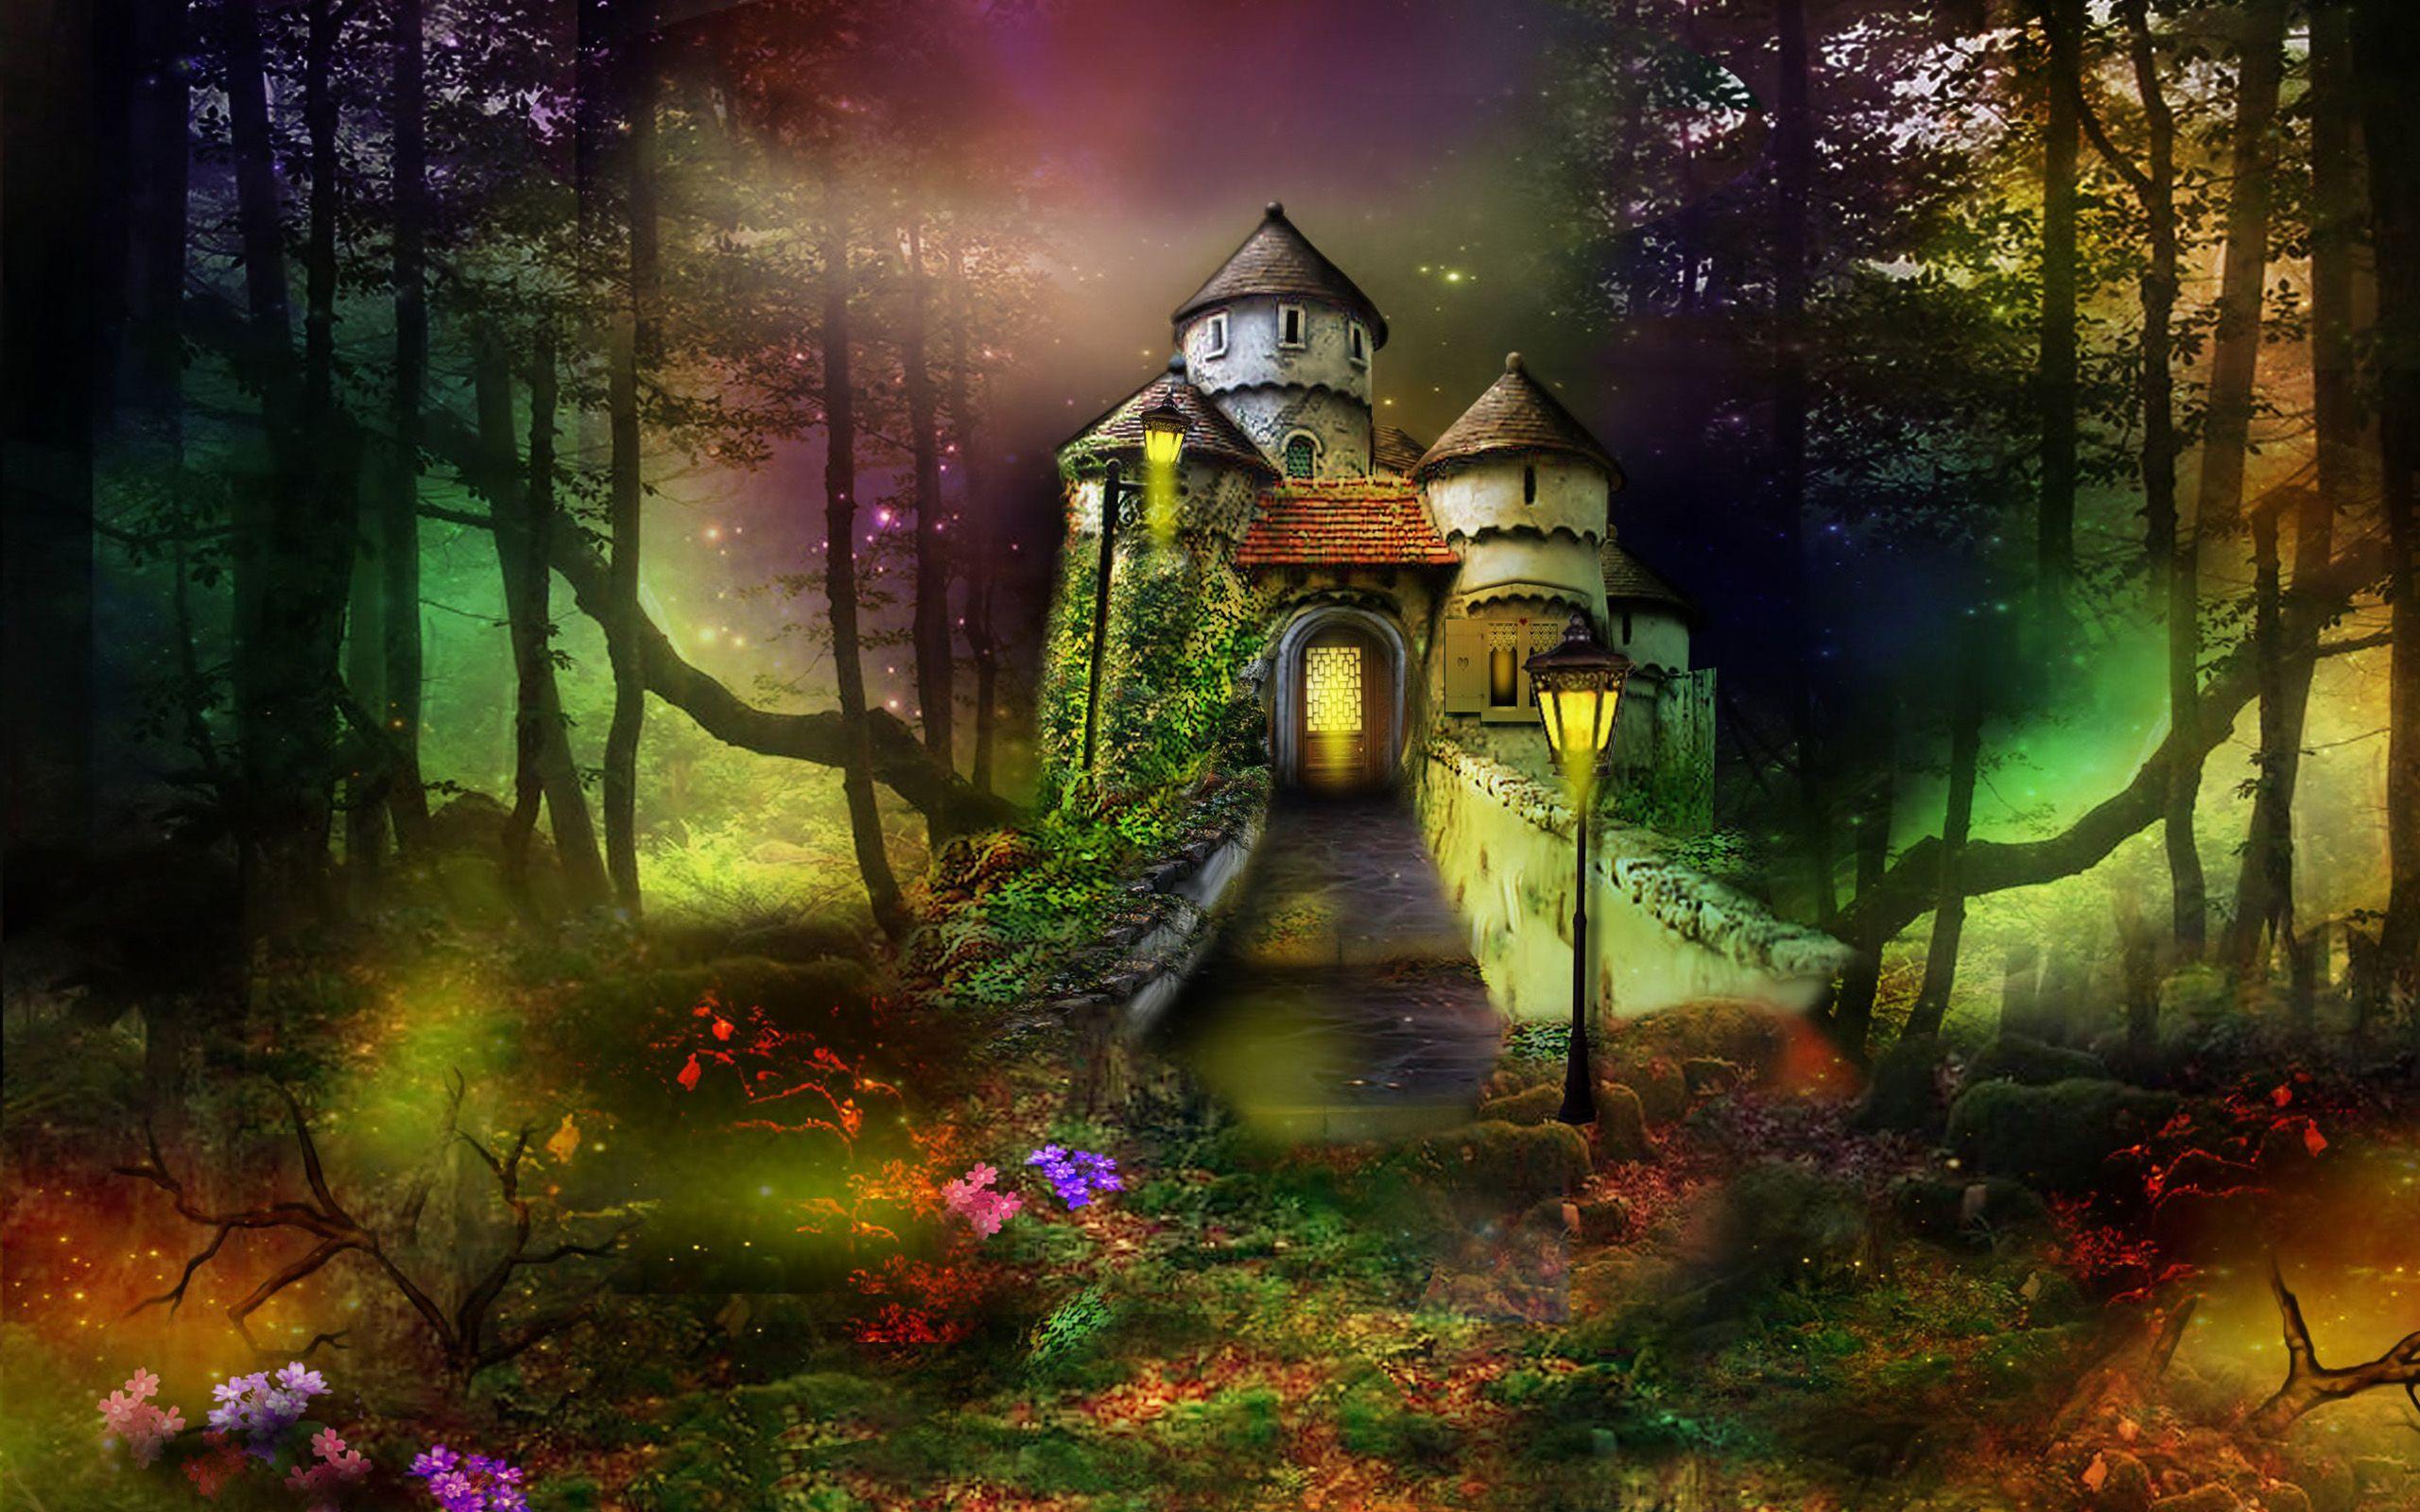 Phantasmagoria Castle Fantasy Forest Fantasy Castle New Wallpaper Hd